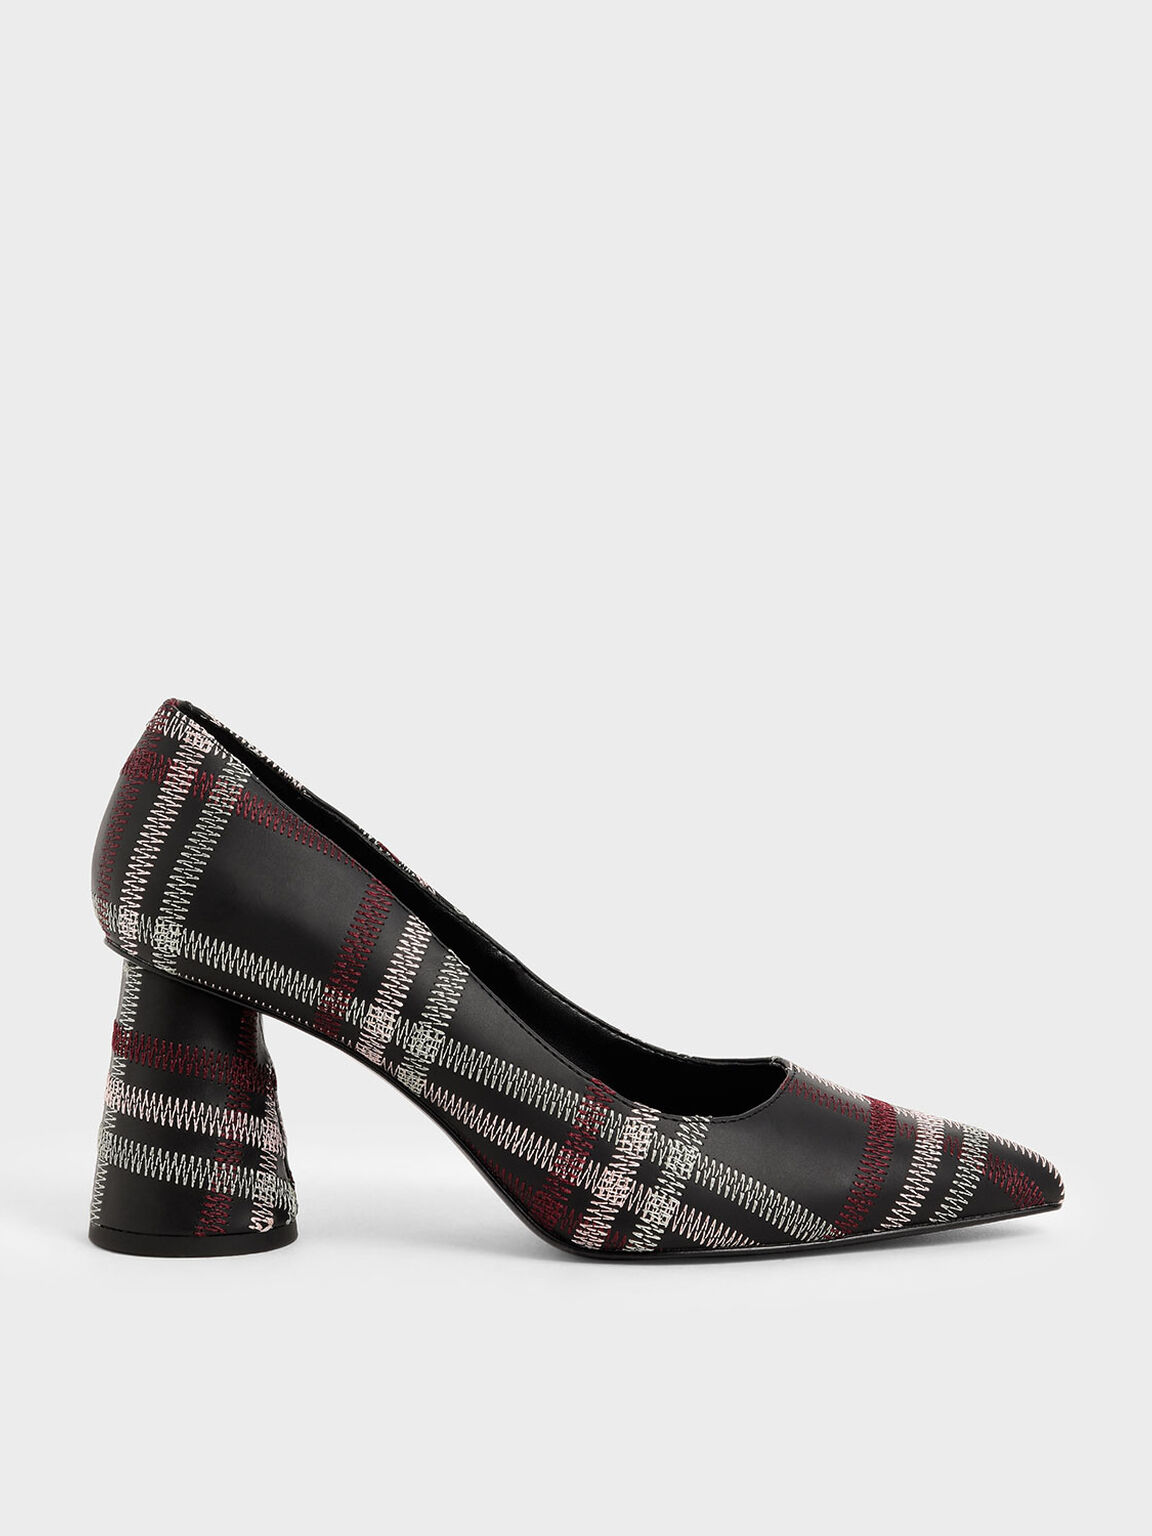 Tartan Cylindrical Heel Pumps, Black Textured, hi-res